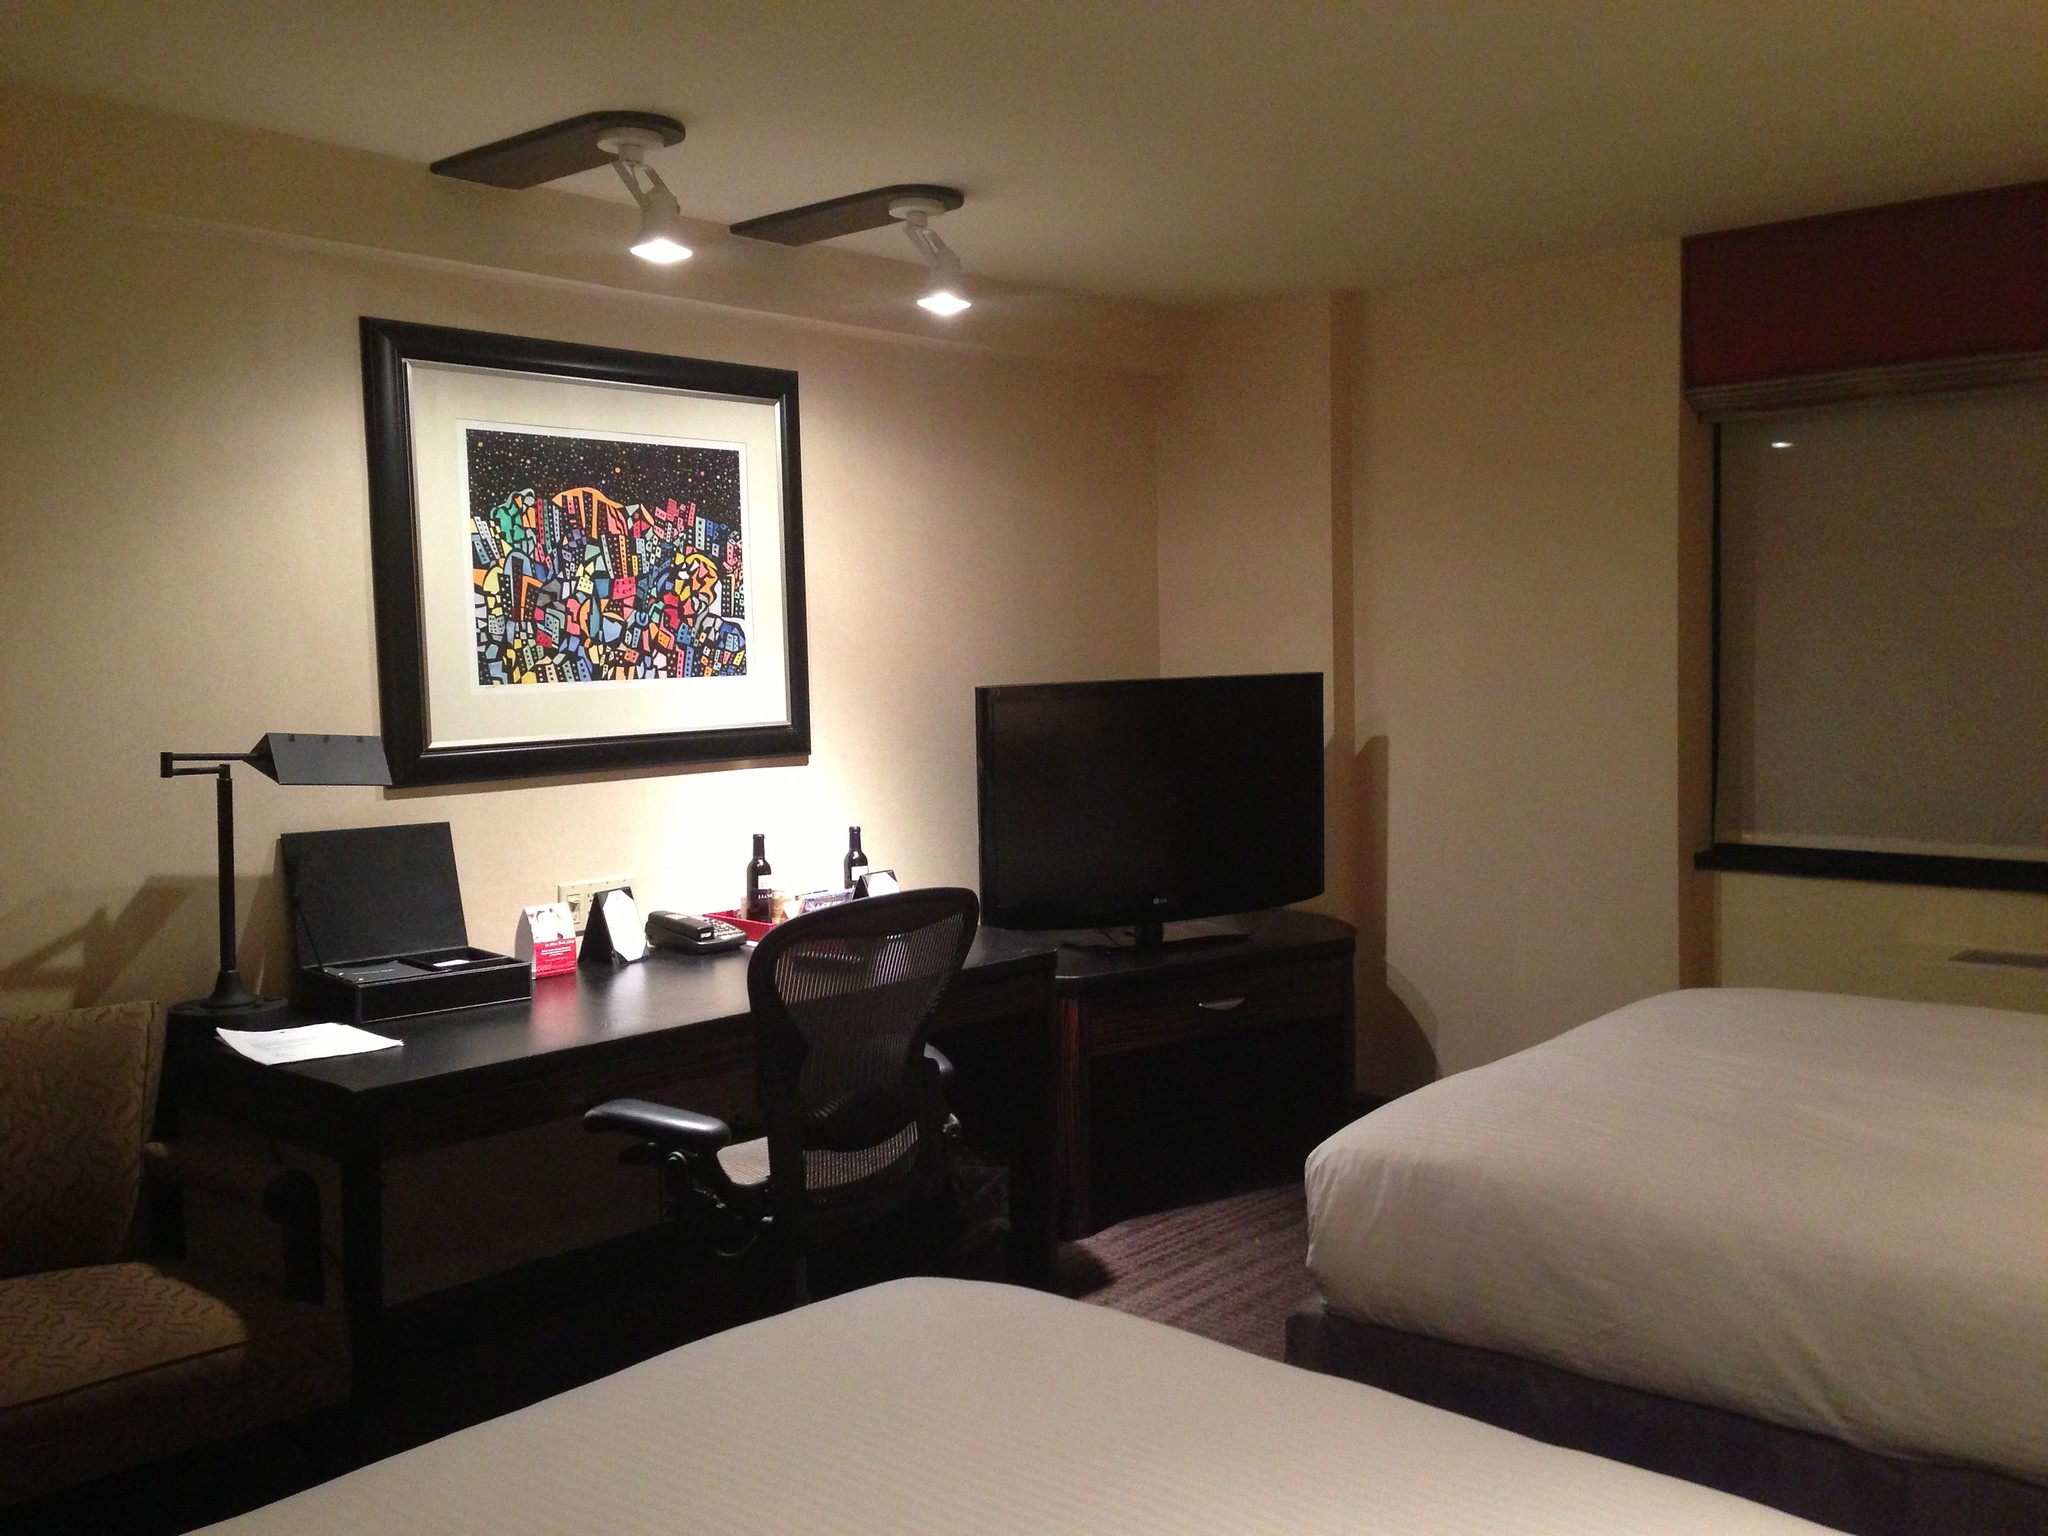 Hotel Dumont New Orleans